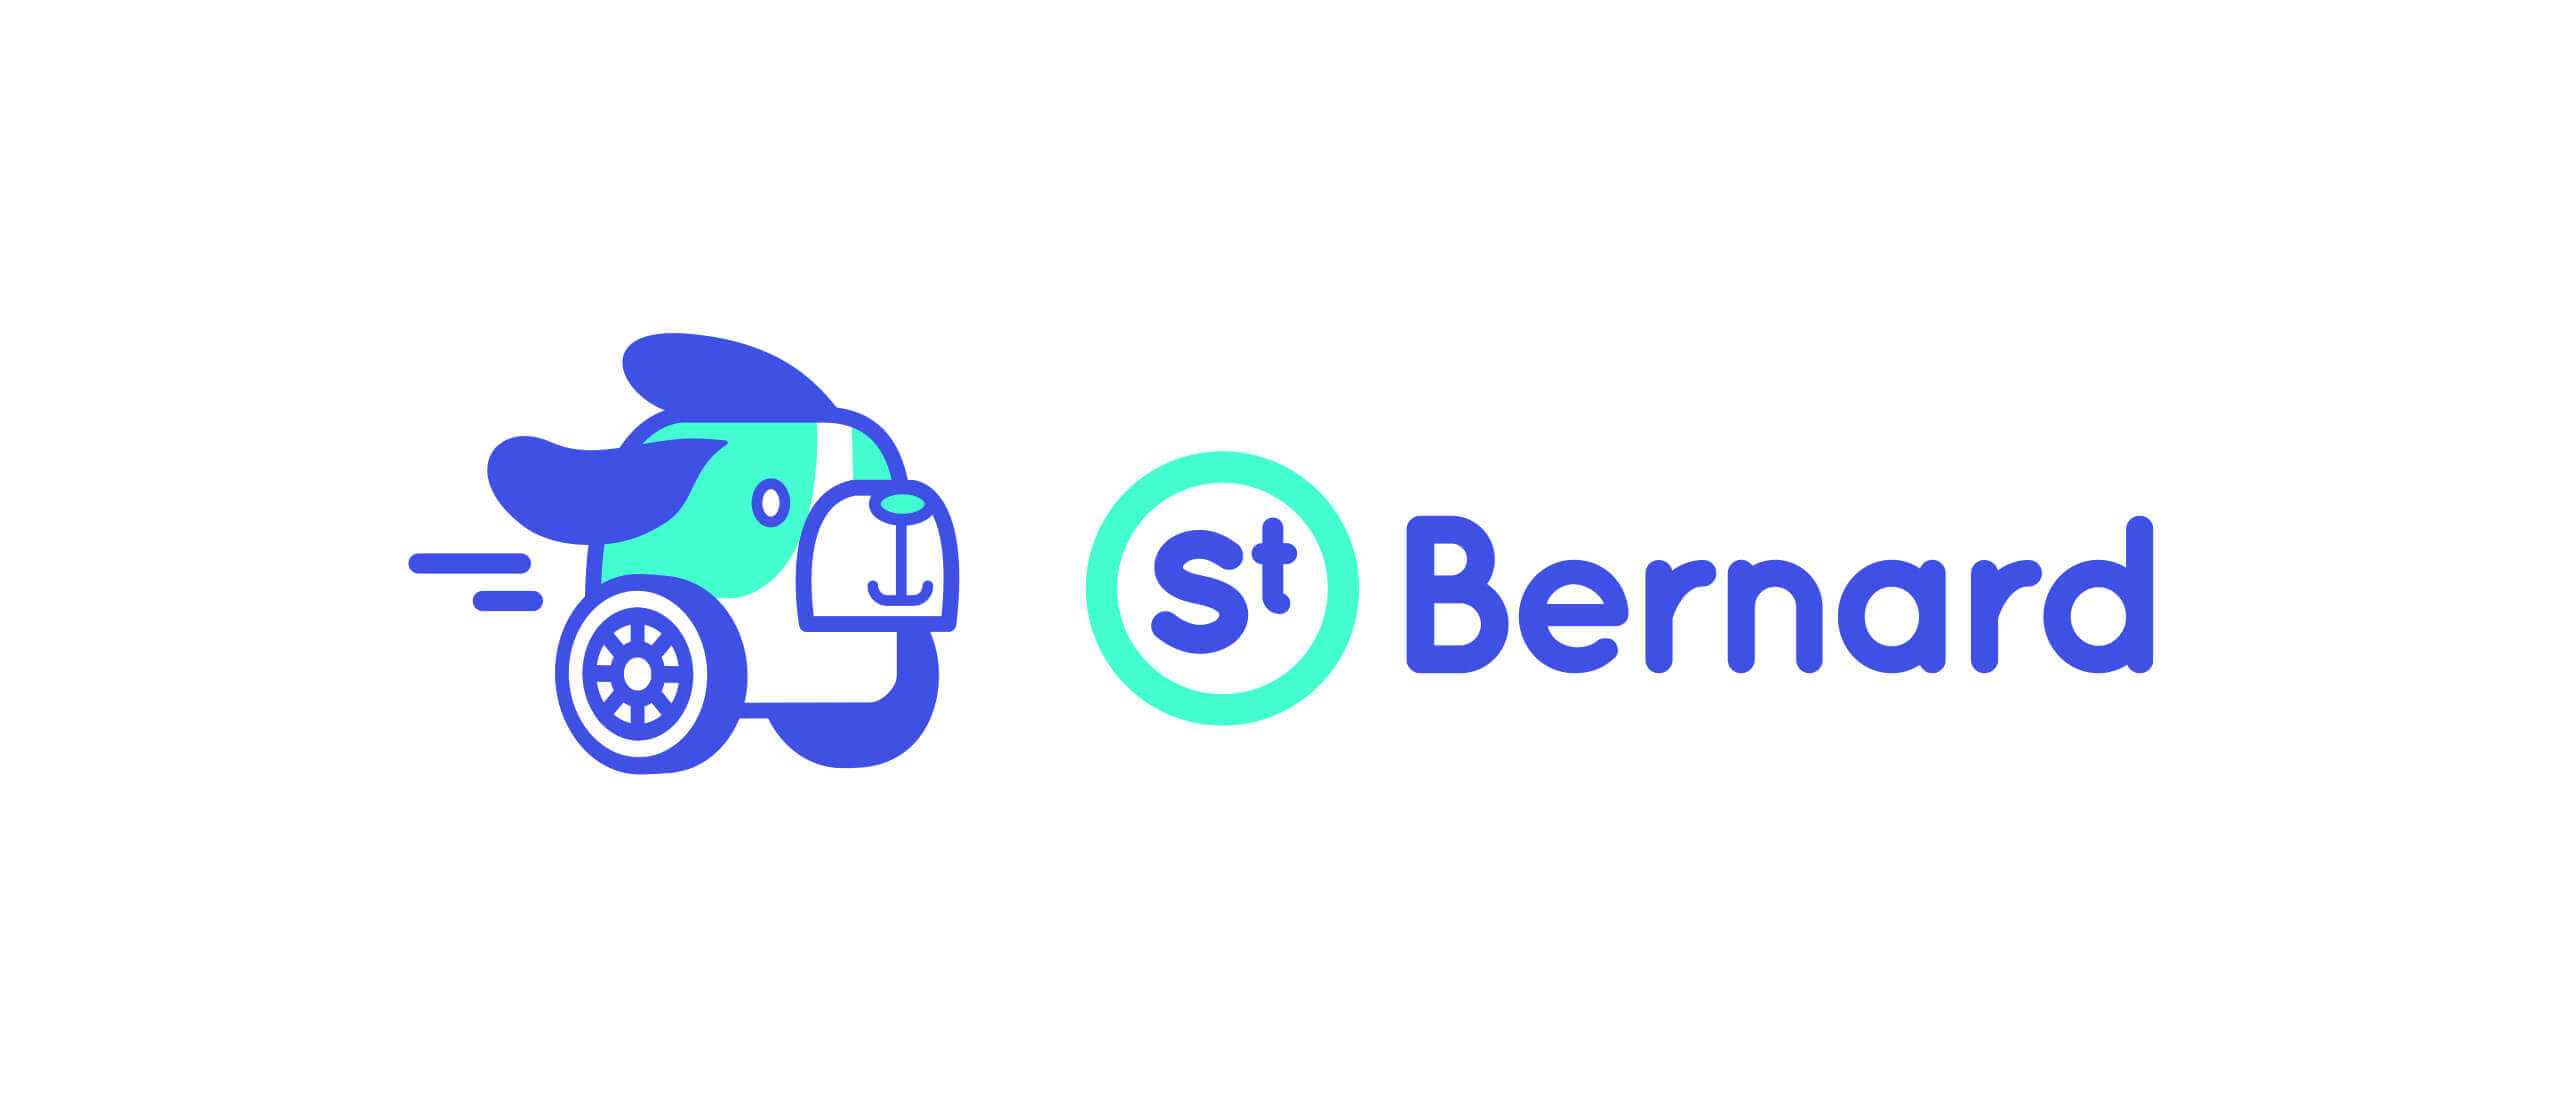 logo saint bernard